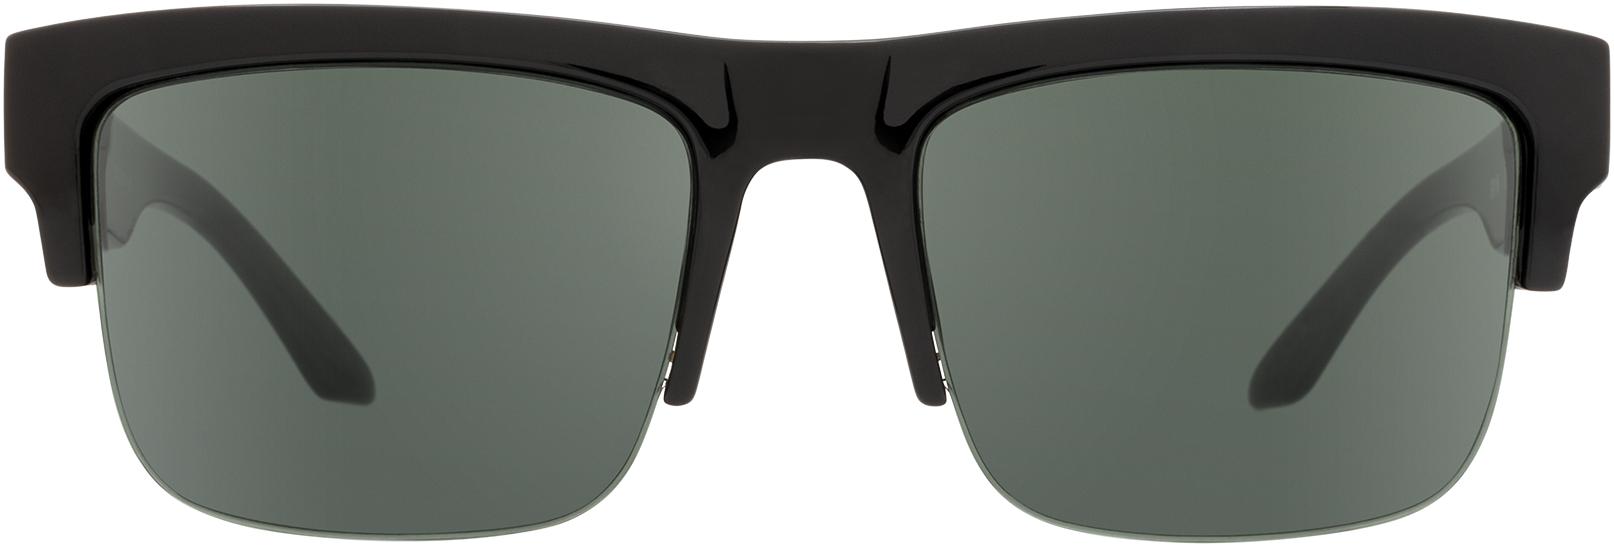 SPY Spy Discord 5050 Sunglasses